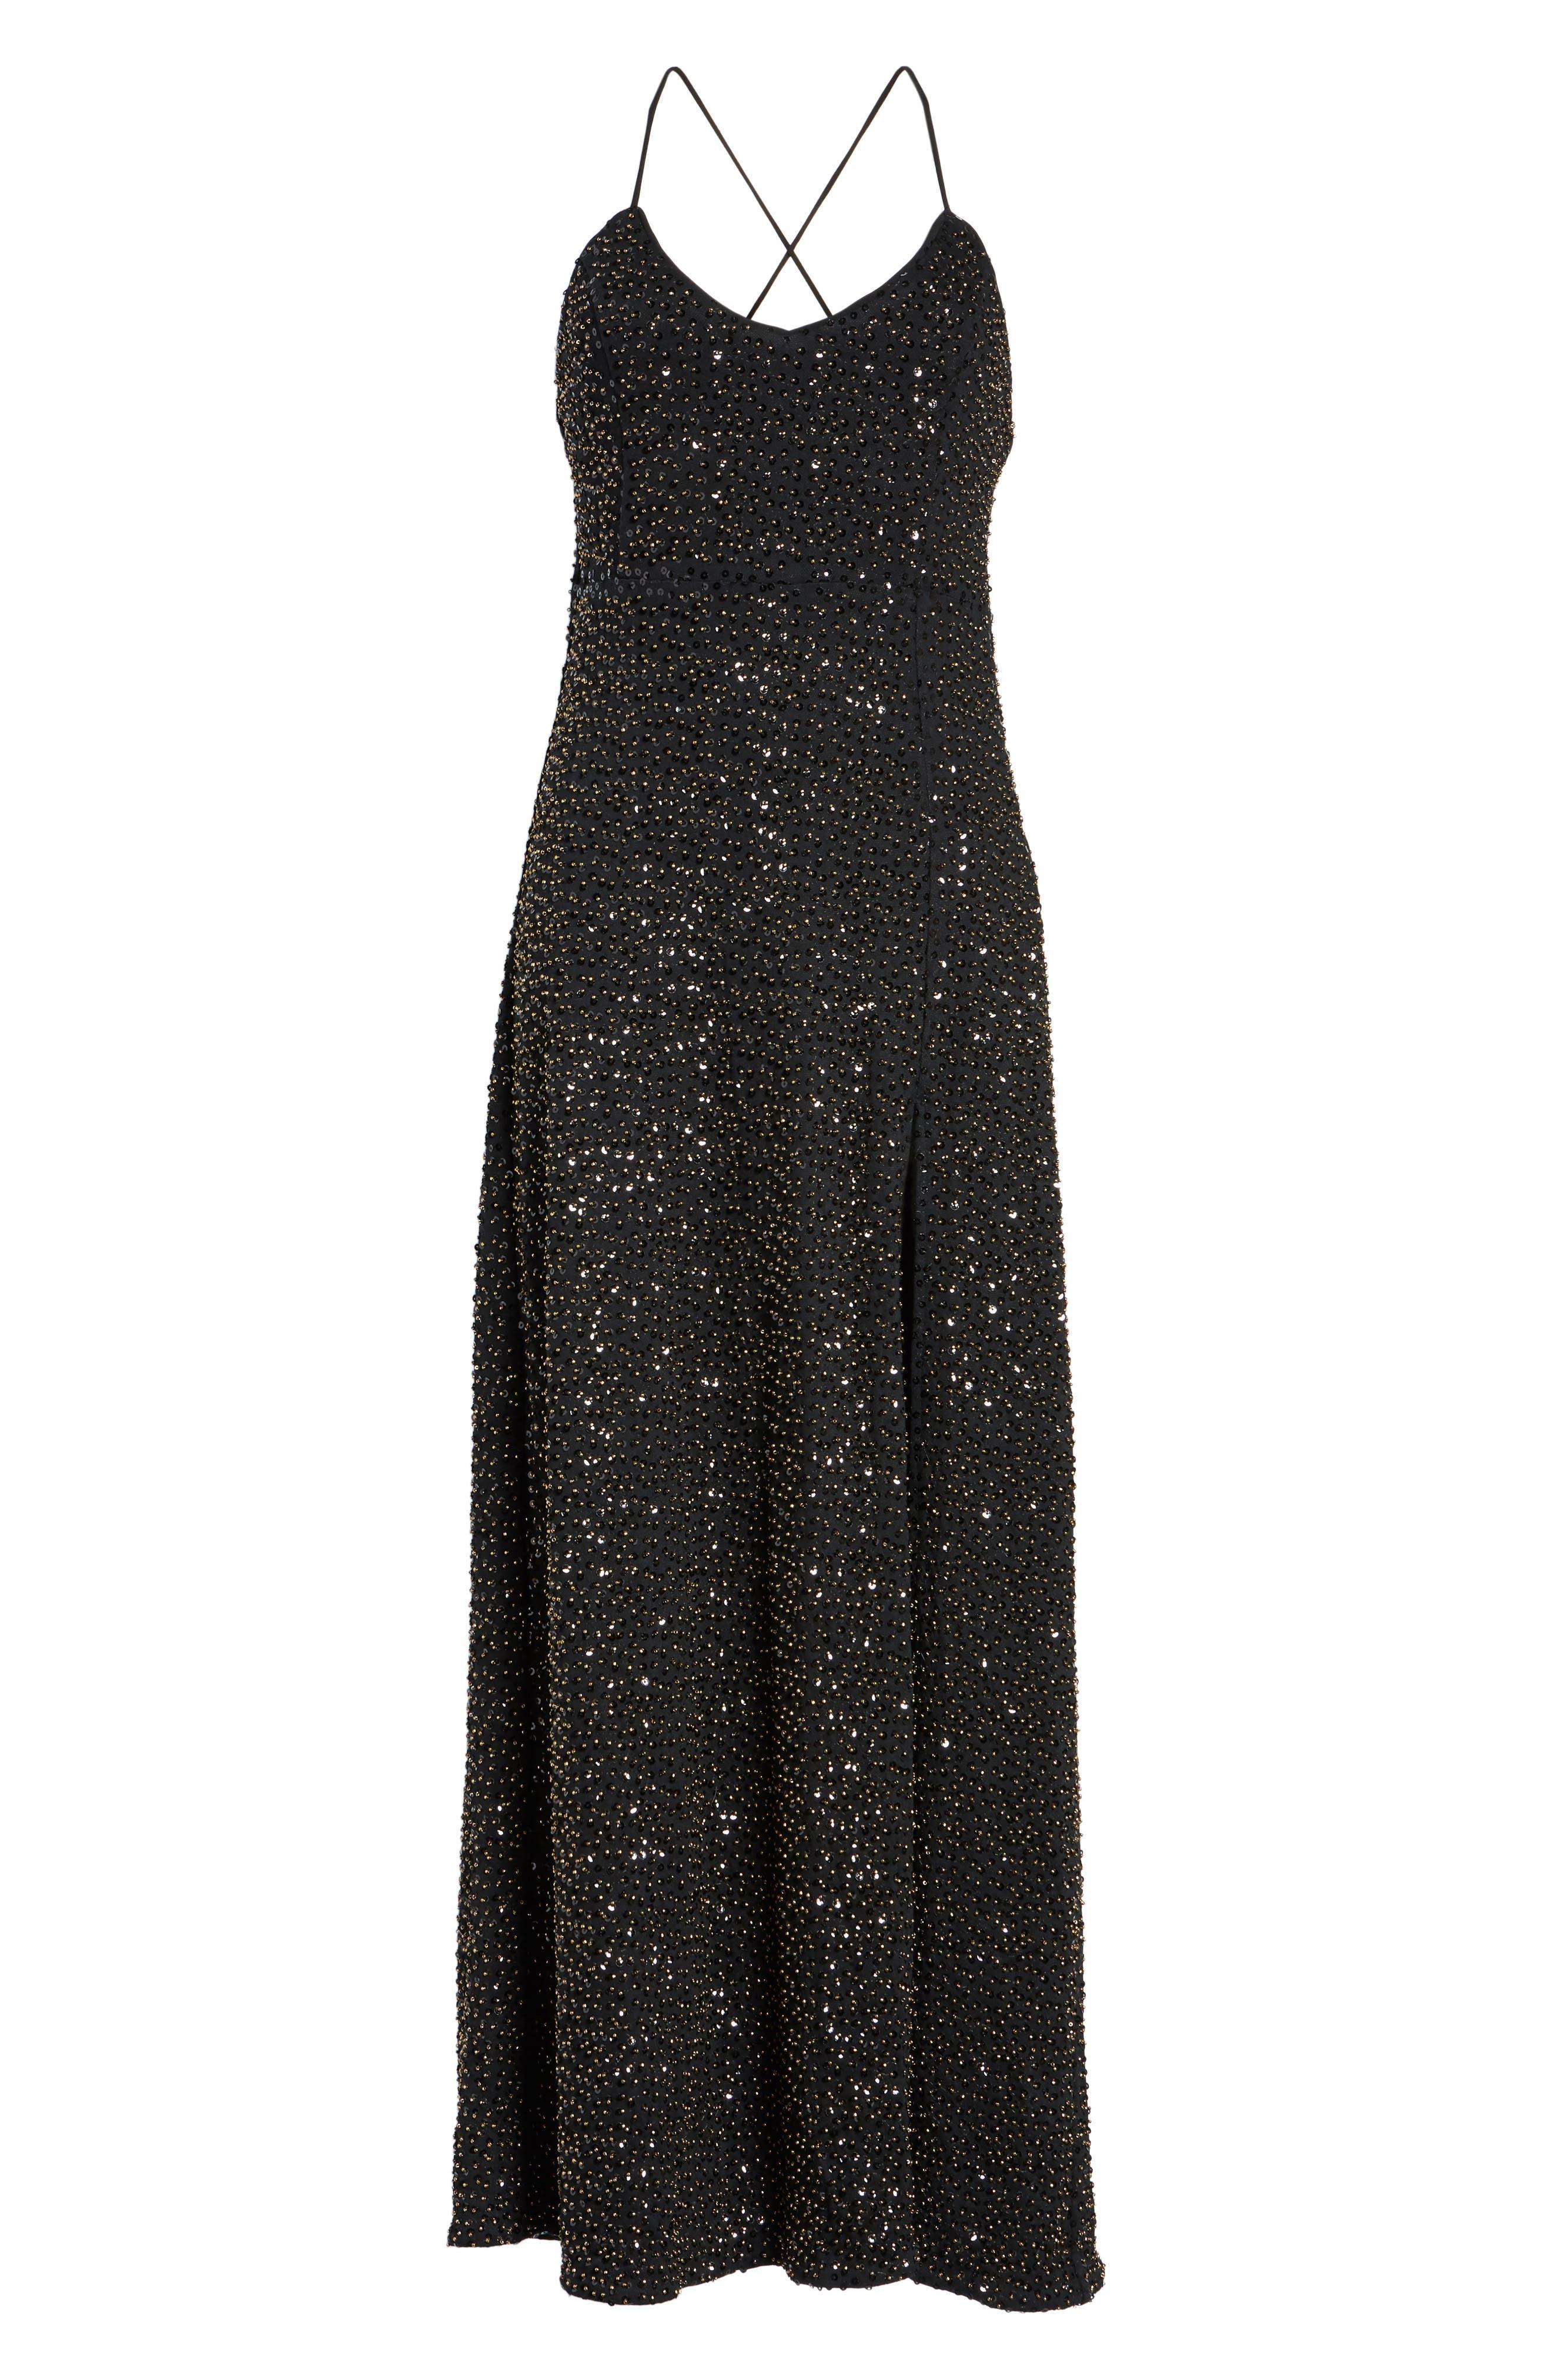 Gracen Maxi Dress,                             Alternate thumbnail 6, color,                             004